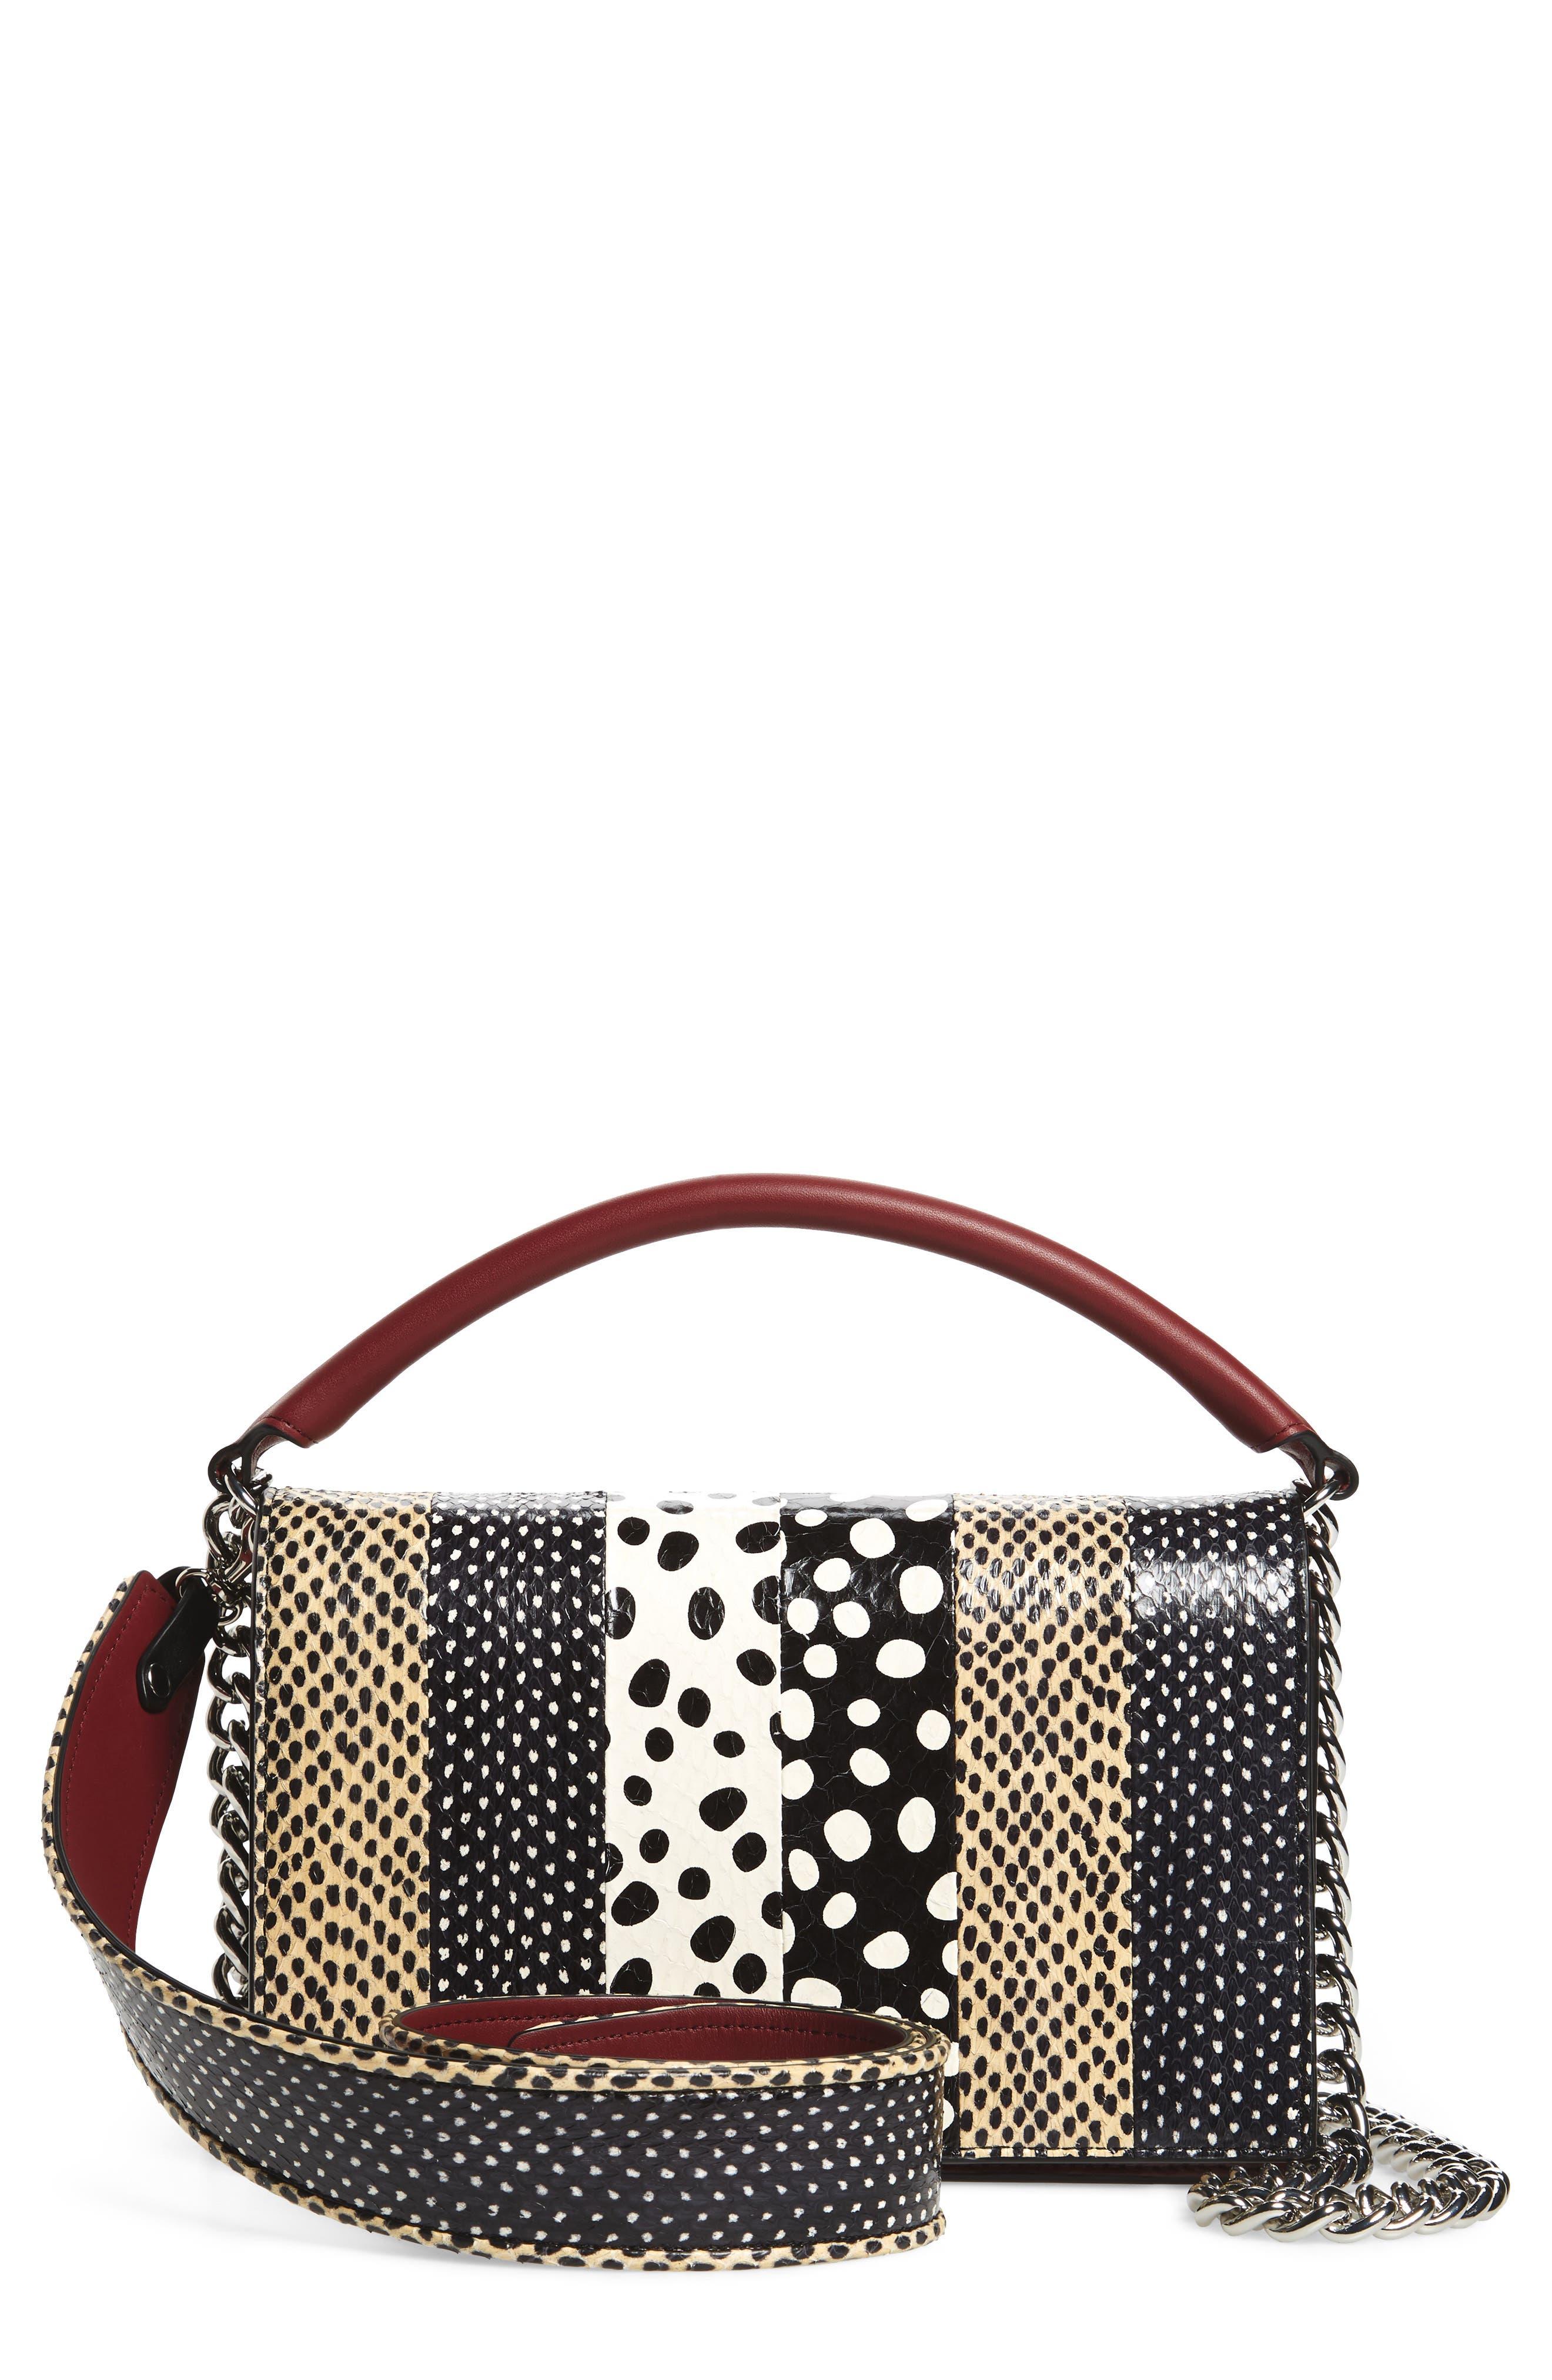 Bonne Soirée Leather & Genuine Snakeskin Top Handle Bag,                         Main,                         color,